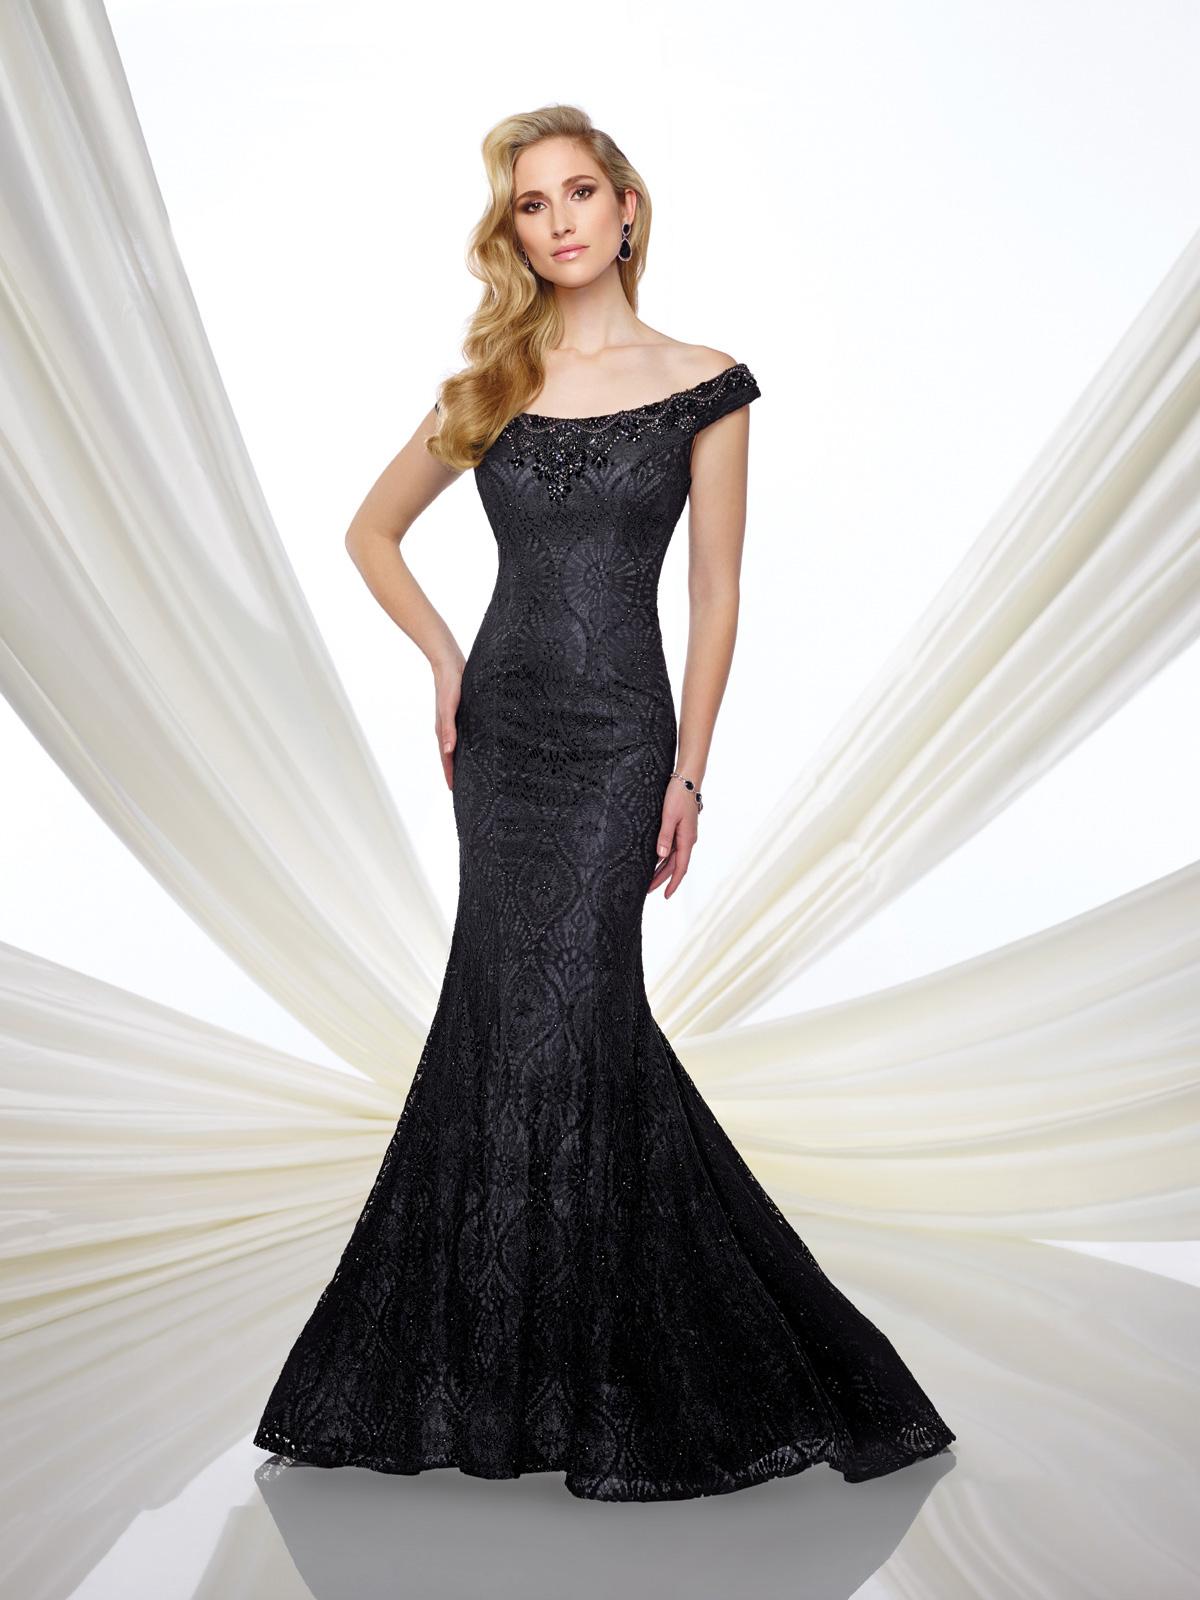 Vestido de Festa ombro a ombro com corte sereia todo confeccionado em renda francesa rebordada com pedrarias.